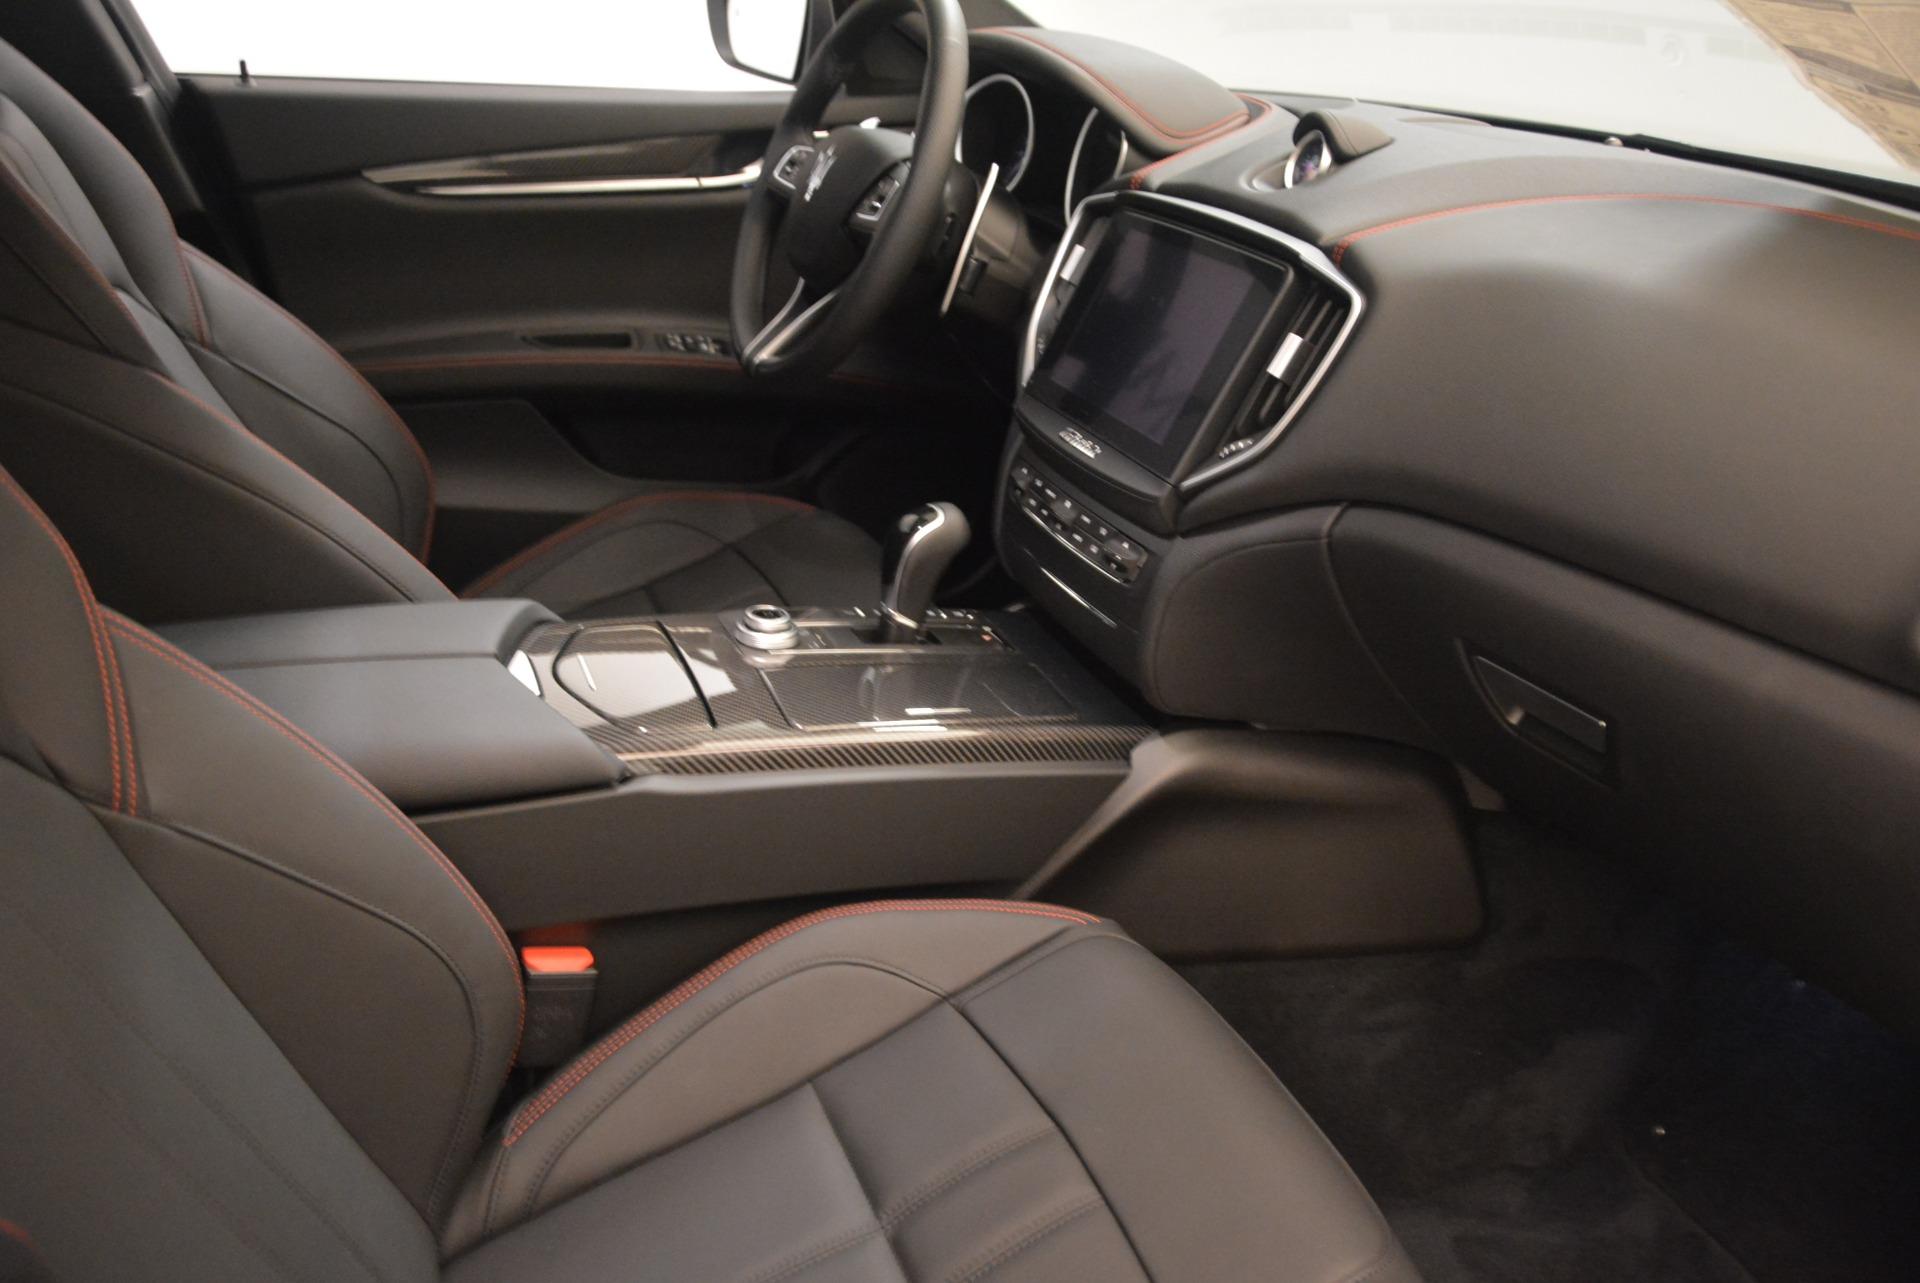 New 2018 Maserati Ghibli SQ4 GranSport Nerissimo For Sale In Westport, CT 2368_p16